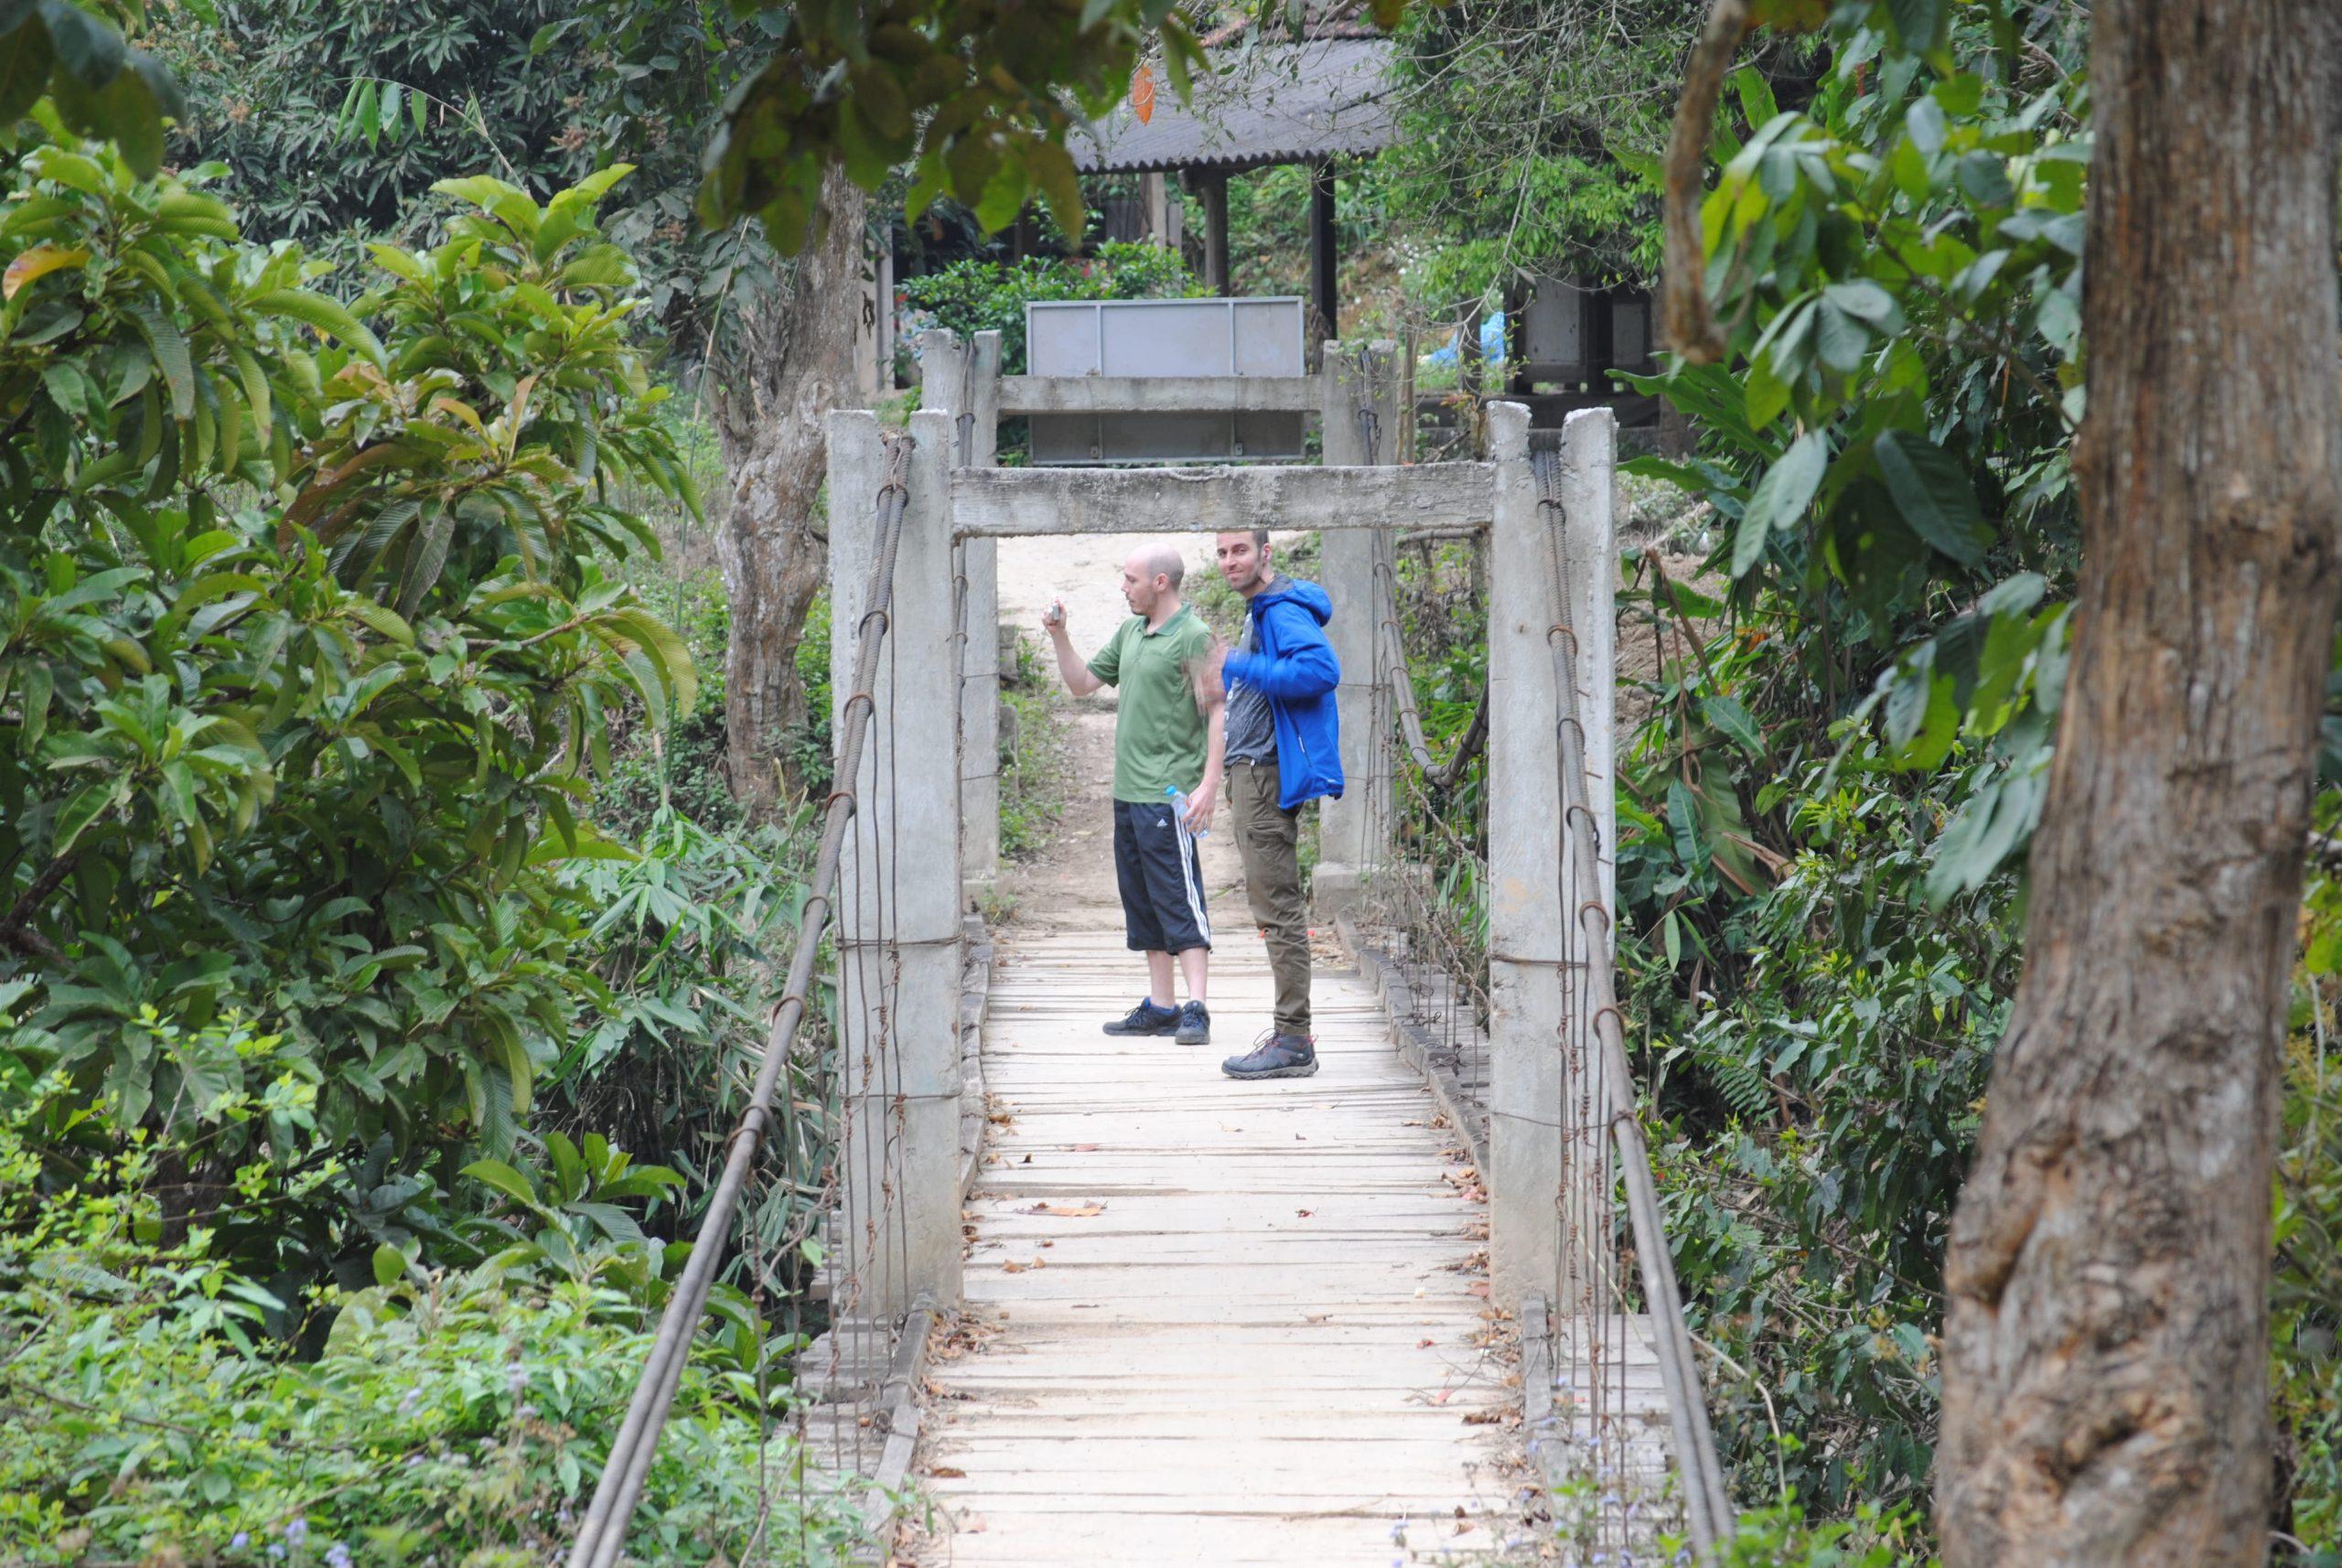 tony vietnam adventures & transfers